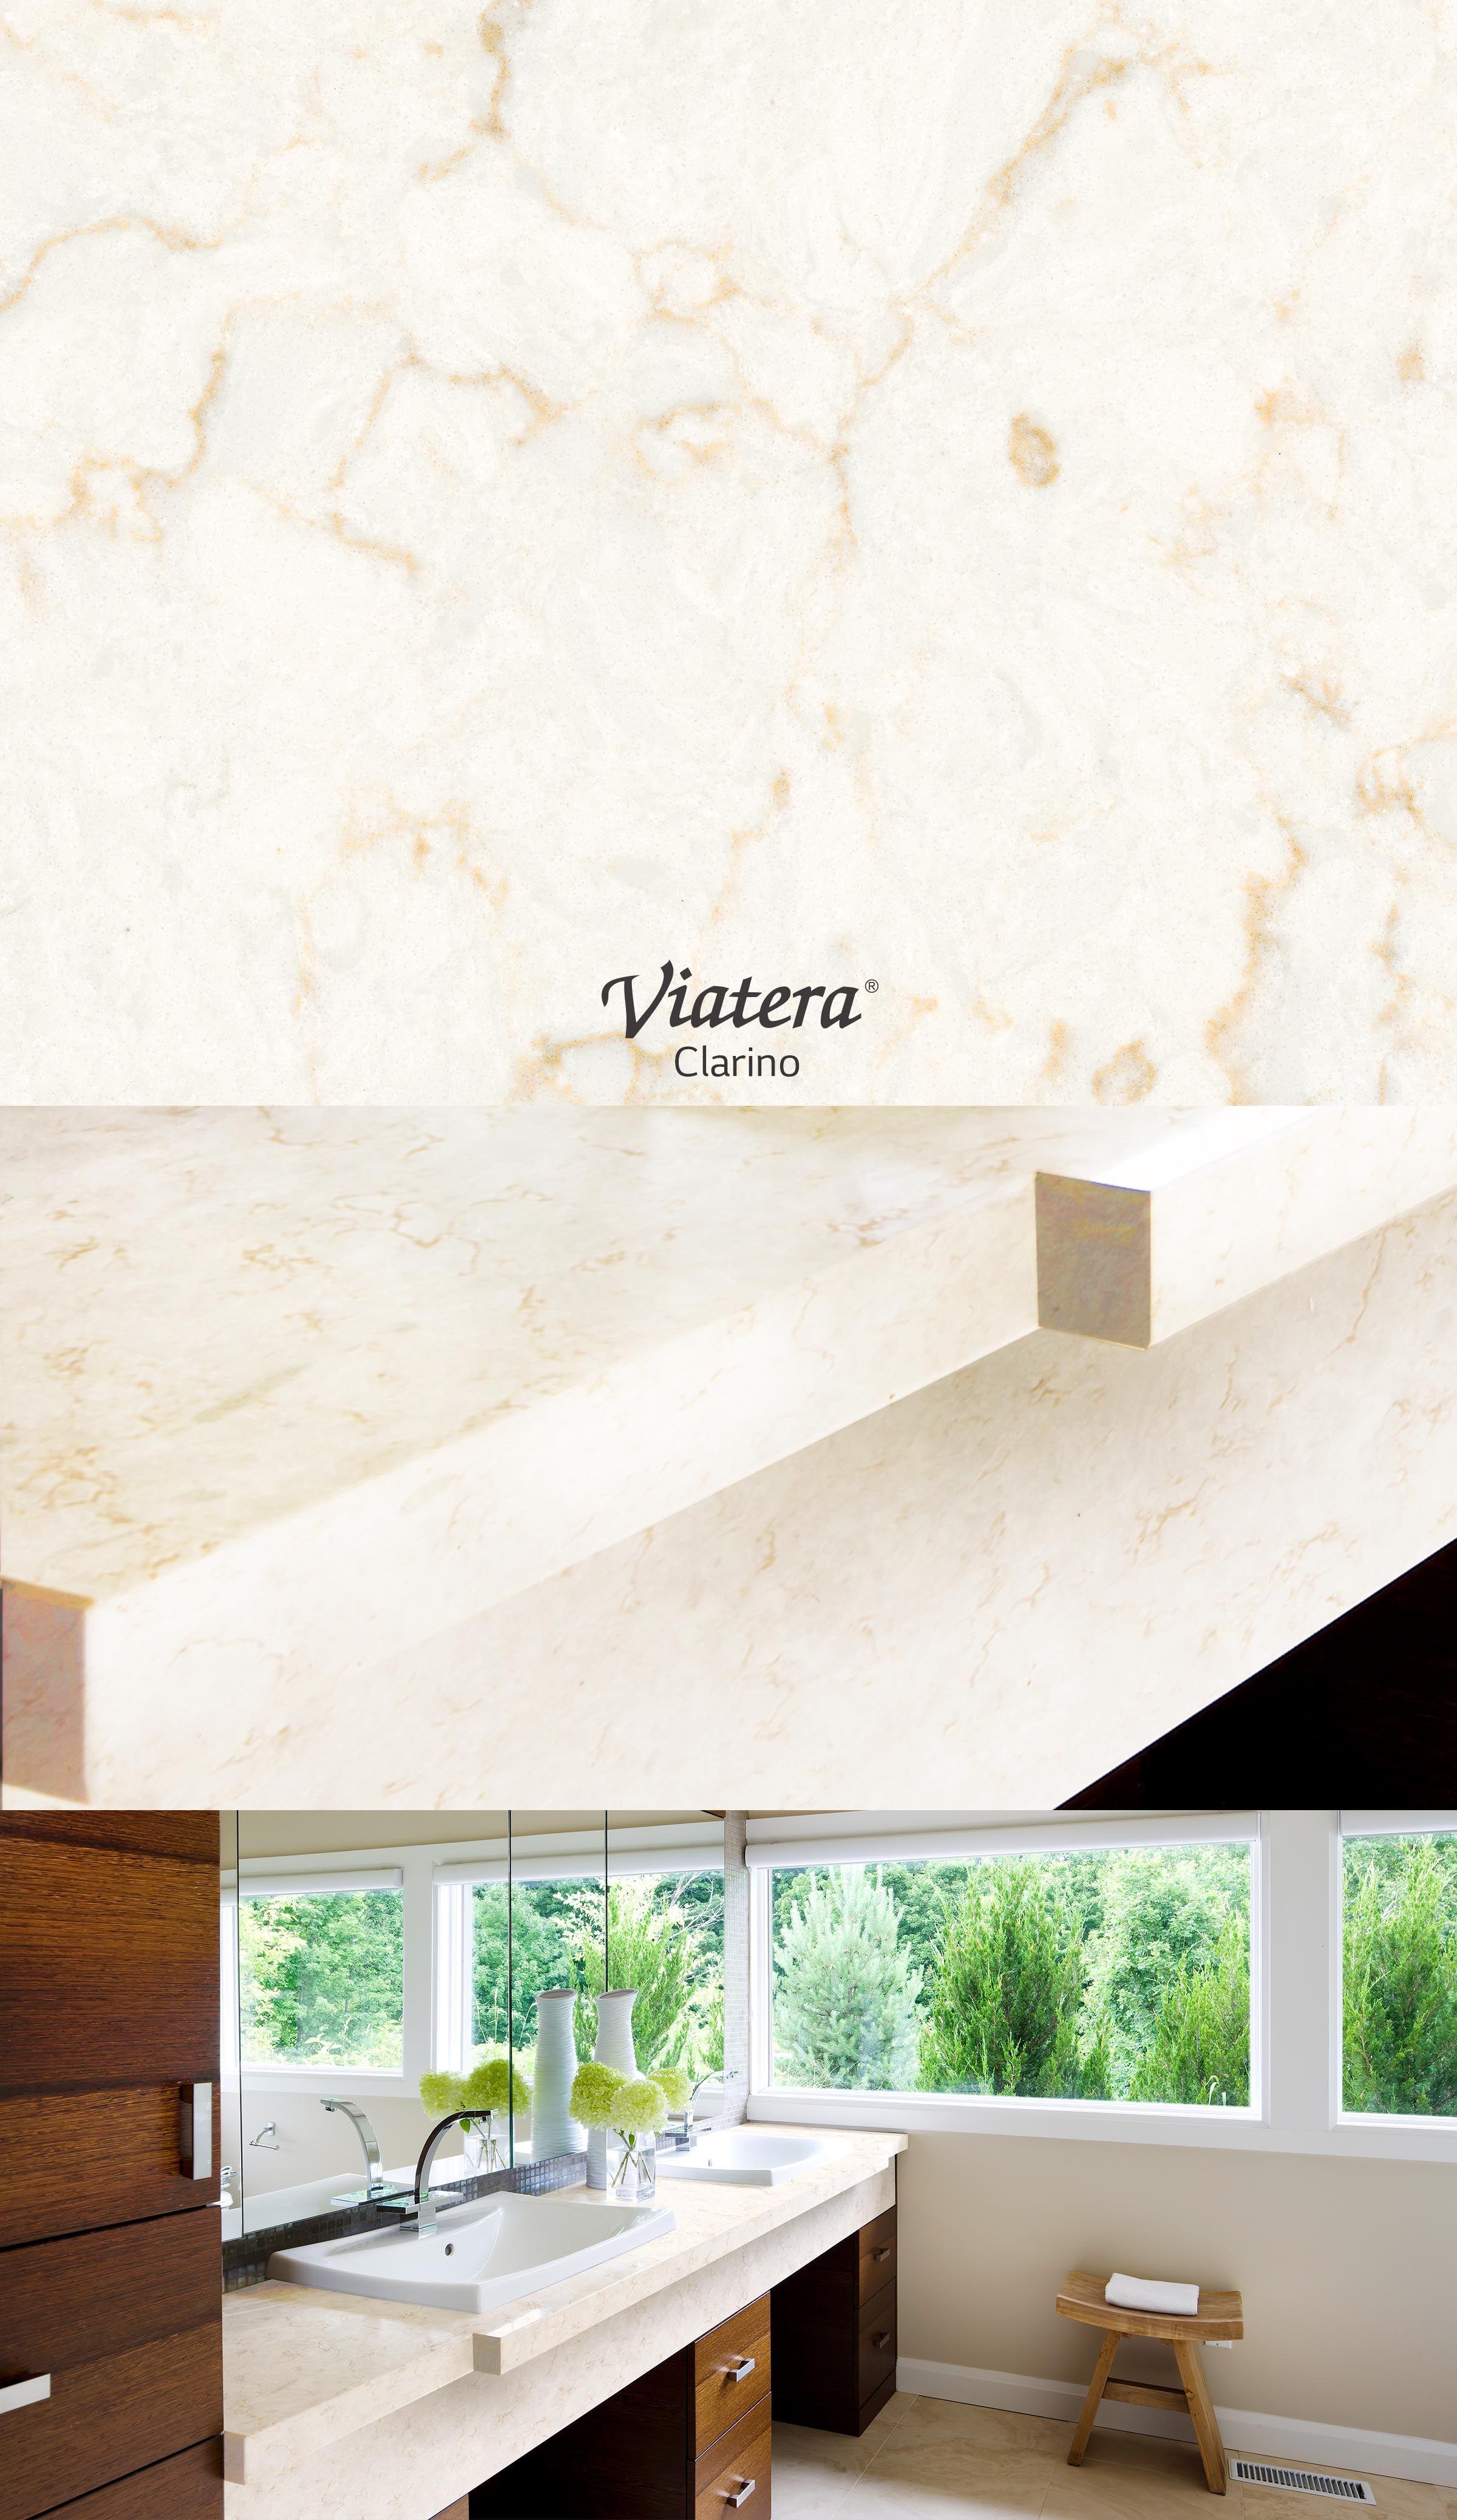 Viatera Clarino L Quartz Countertop Quartz Kitchen Countertops